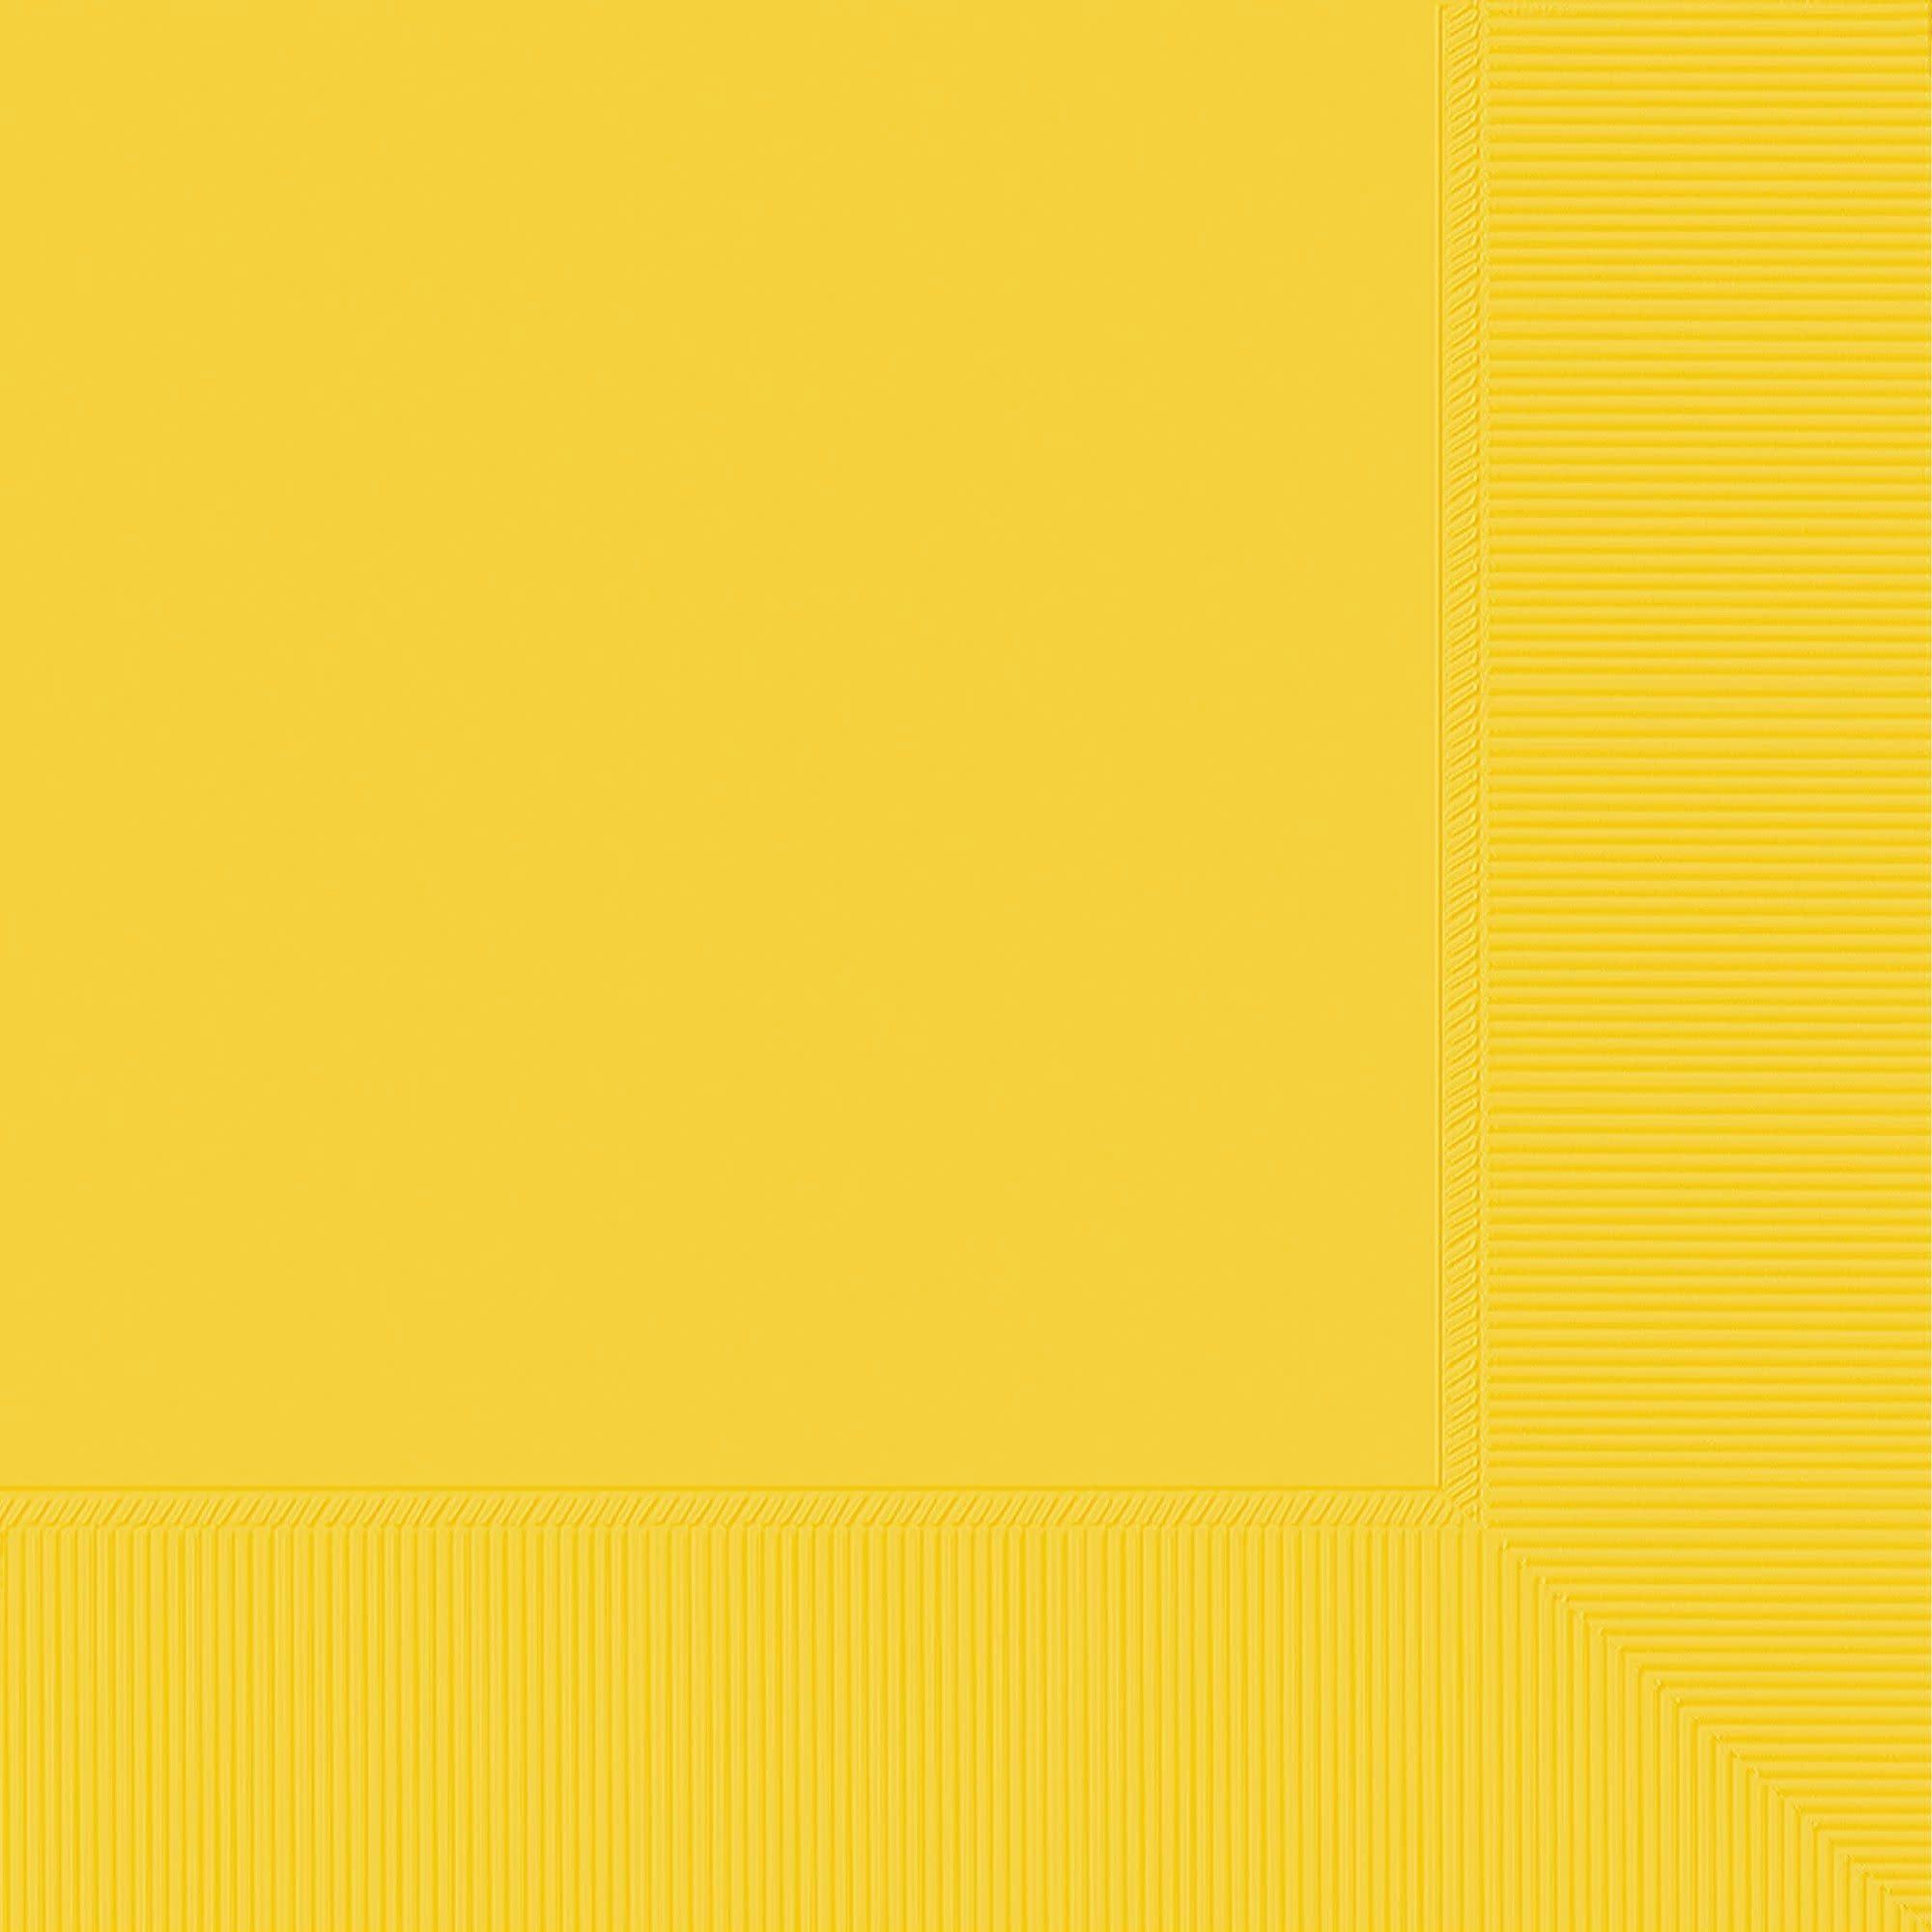 Beverage Napkins, Mid Ct. - Yellow Sunshine